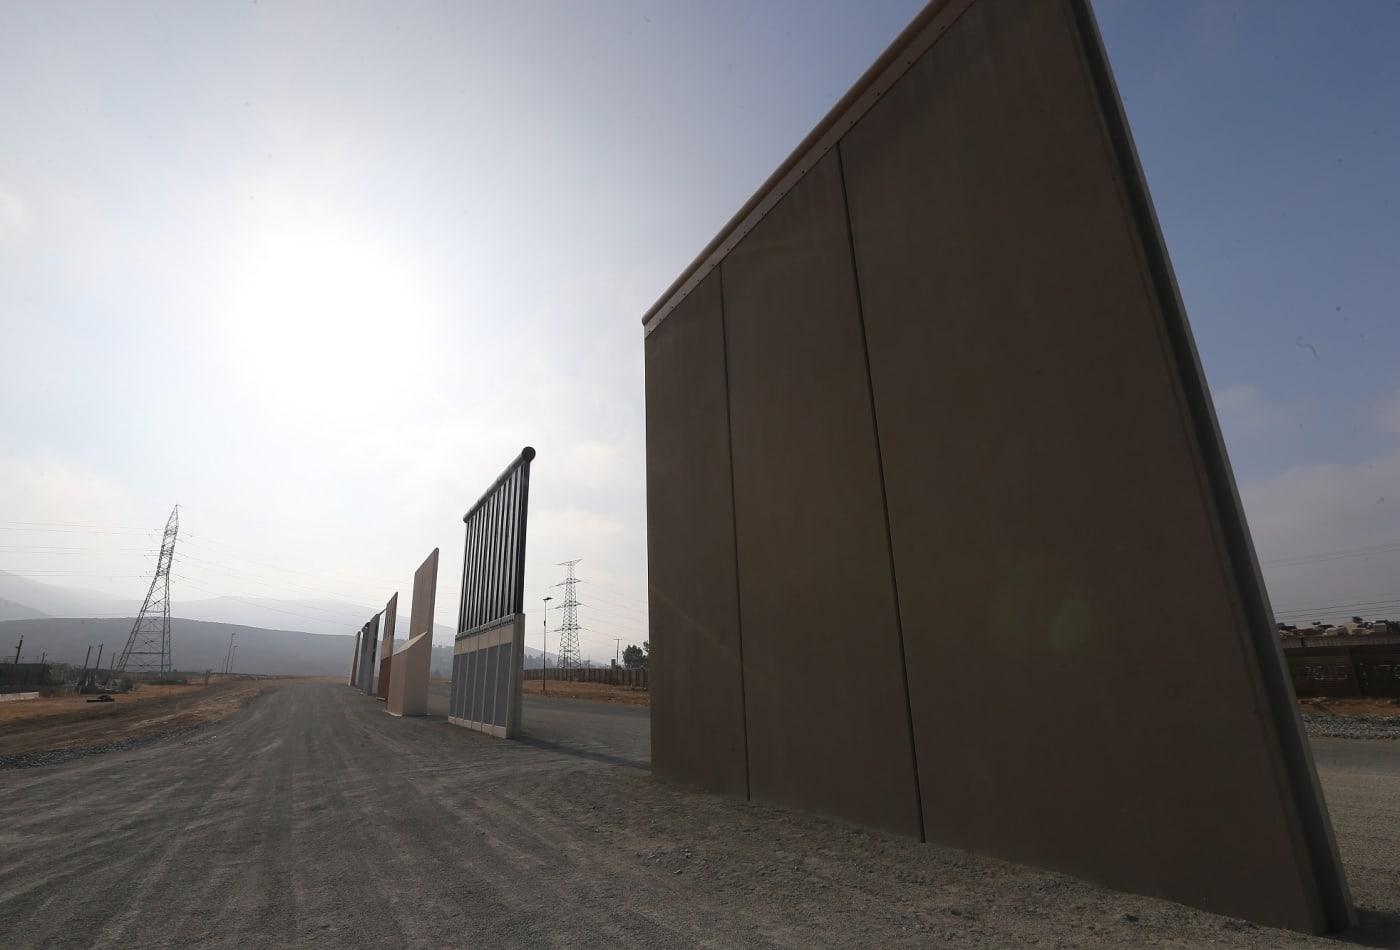 GoFundMe that raised $20 million for border wall will return